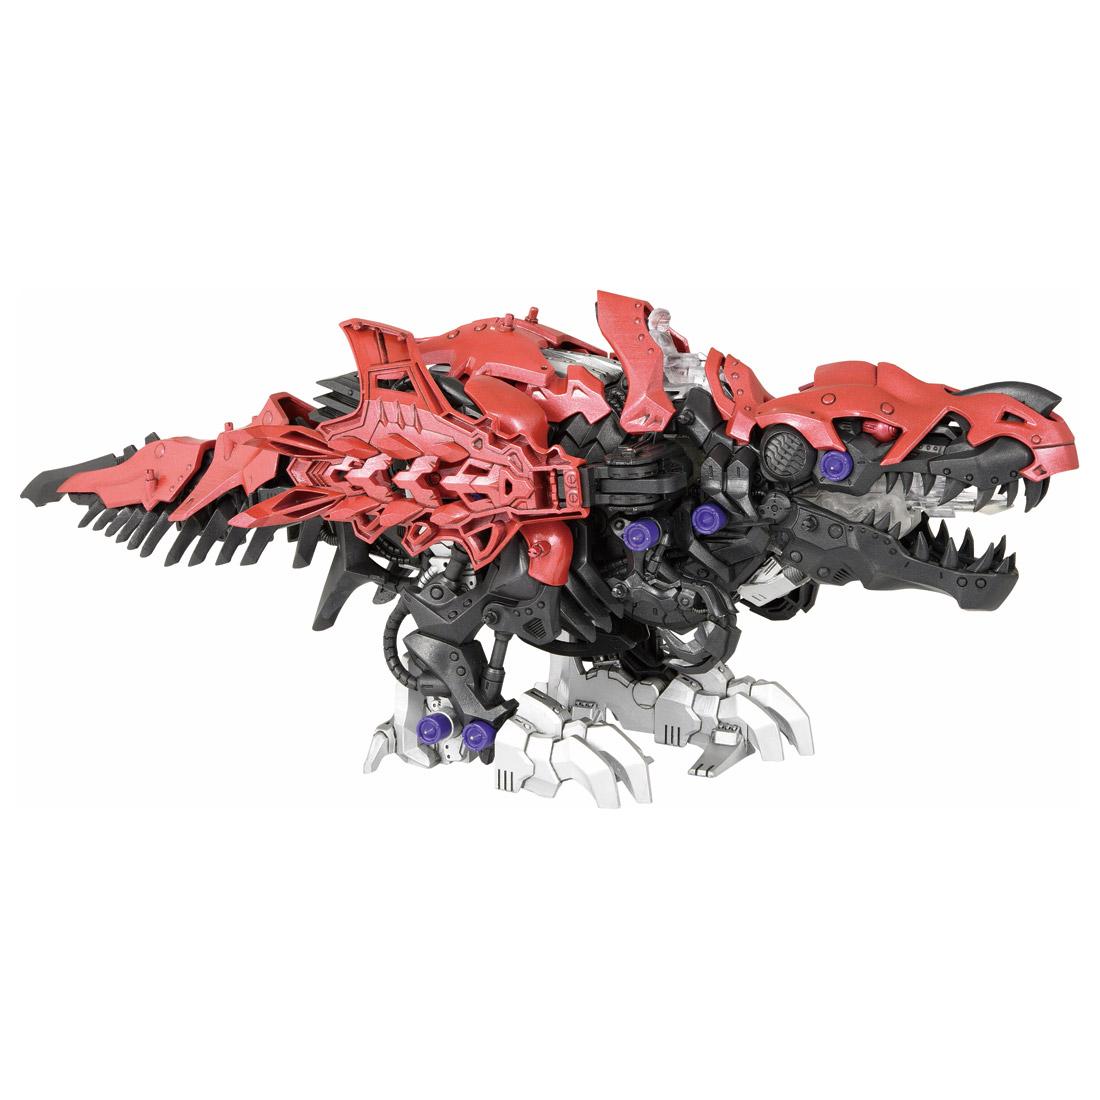 TAKARA TOMY 索斯机械兽:荒野纪 Death Rex 死亡暴龙